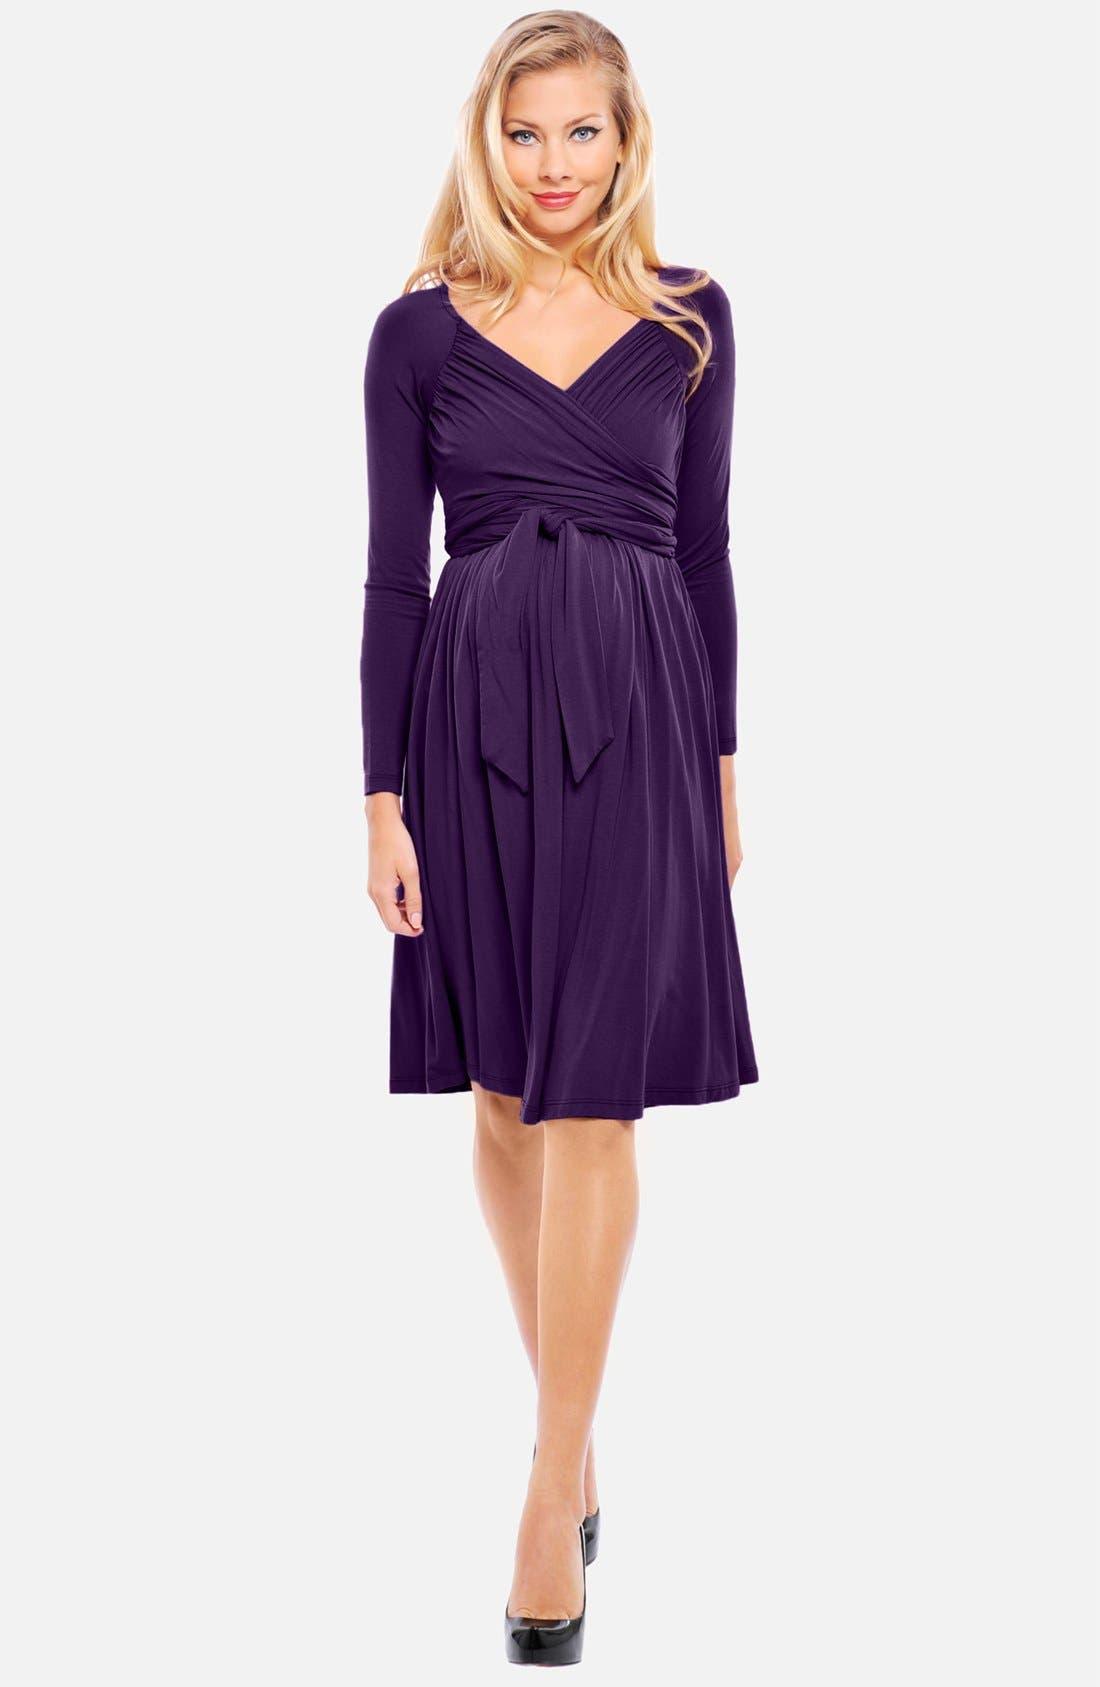 Main Image - Olian 'Lucy' Draped Stretch Knit Maternity Dress